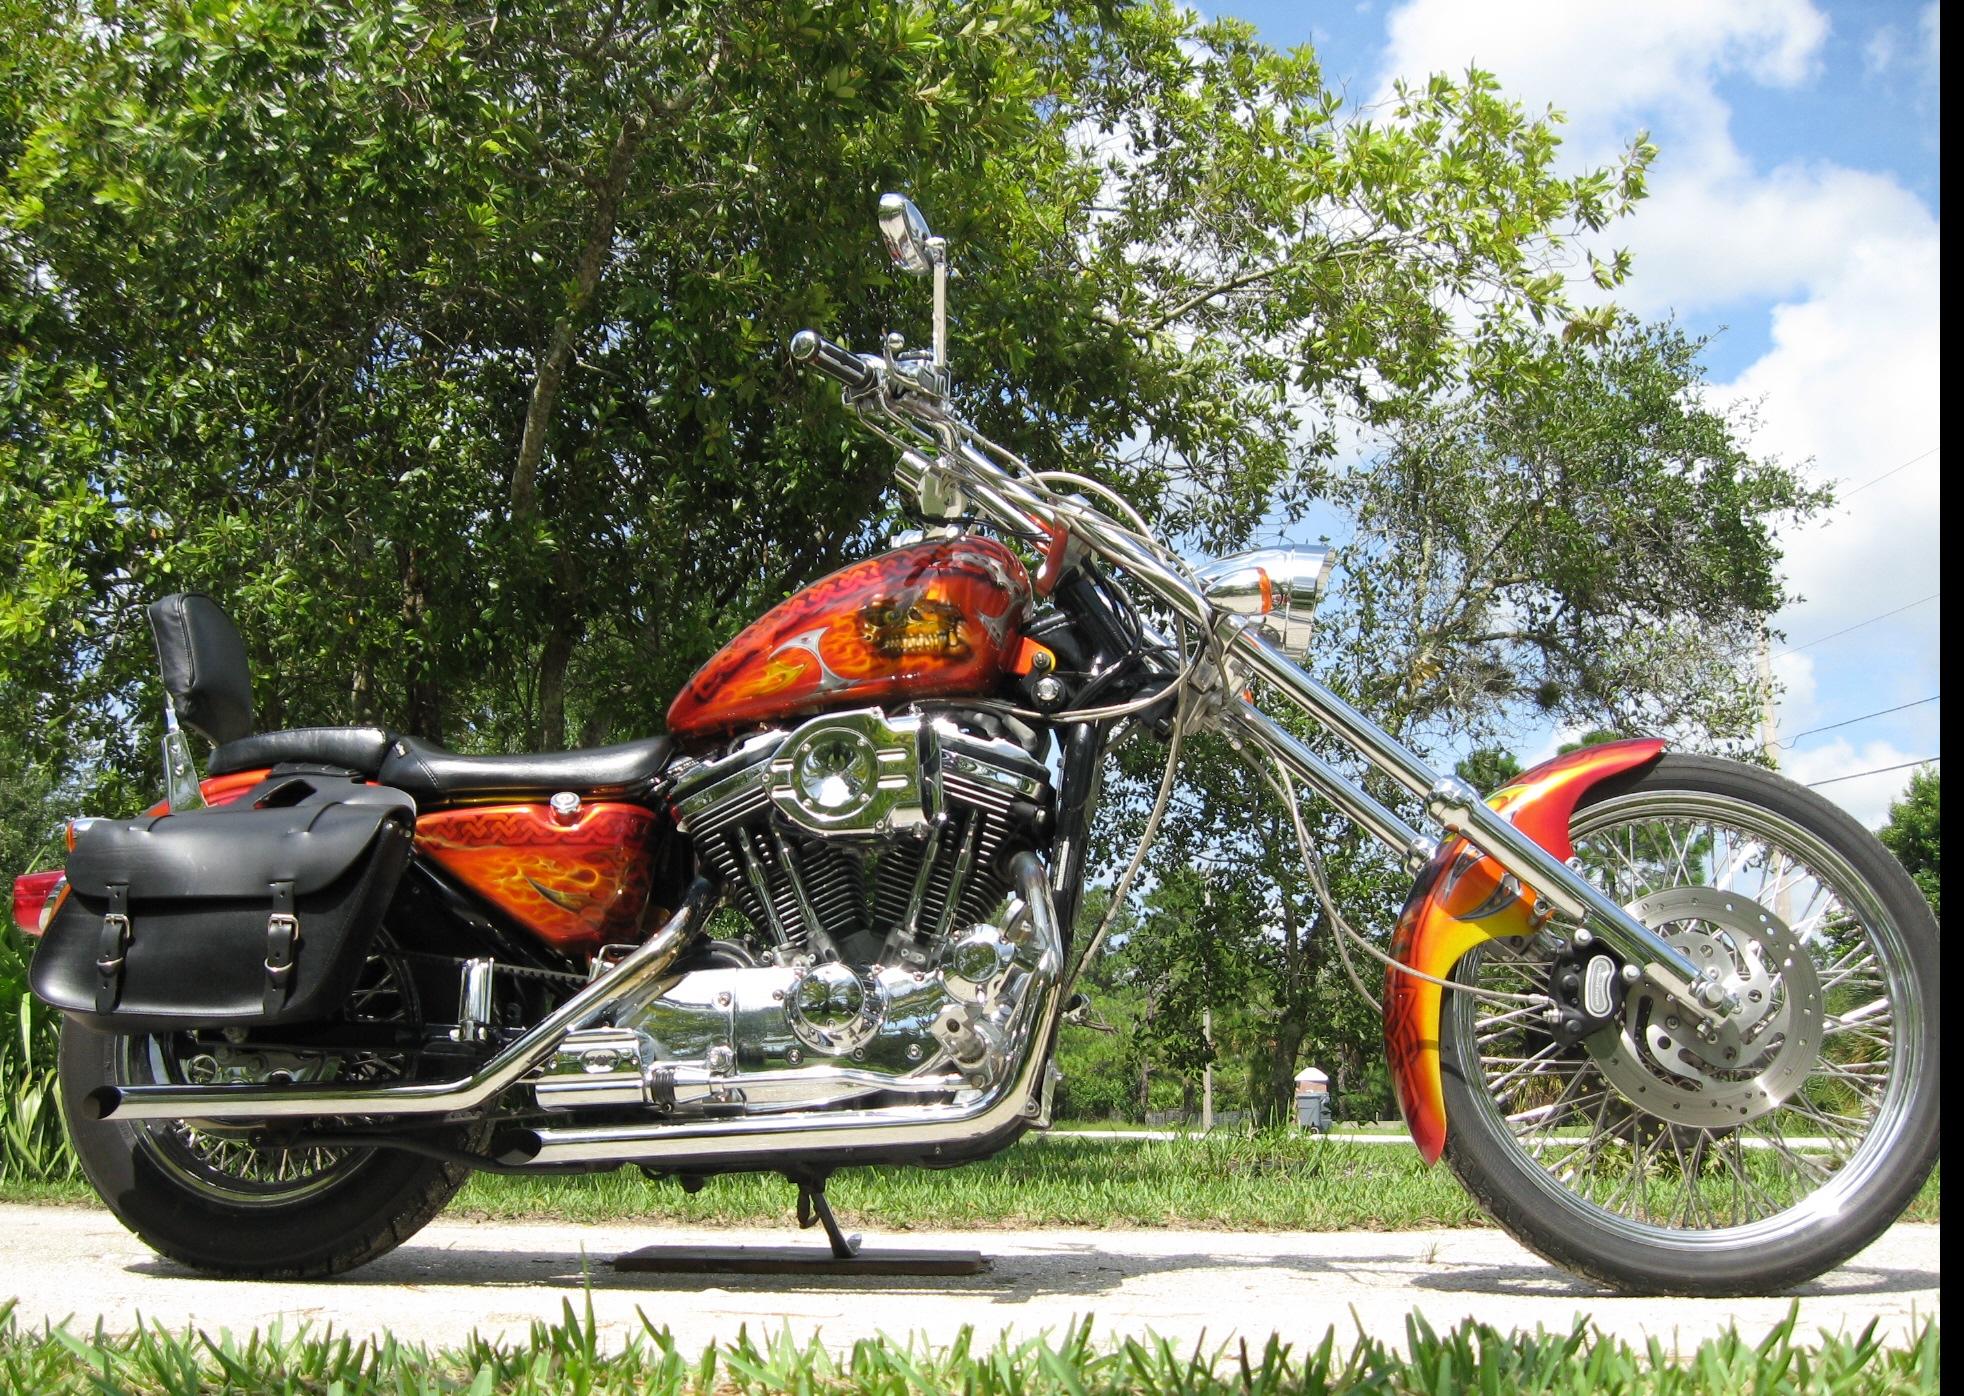 Harley-Davidson-Fantasy-True-Flame-Dragon-Skull-Bike